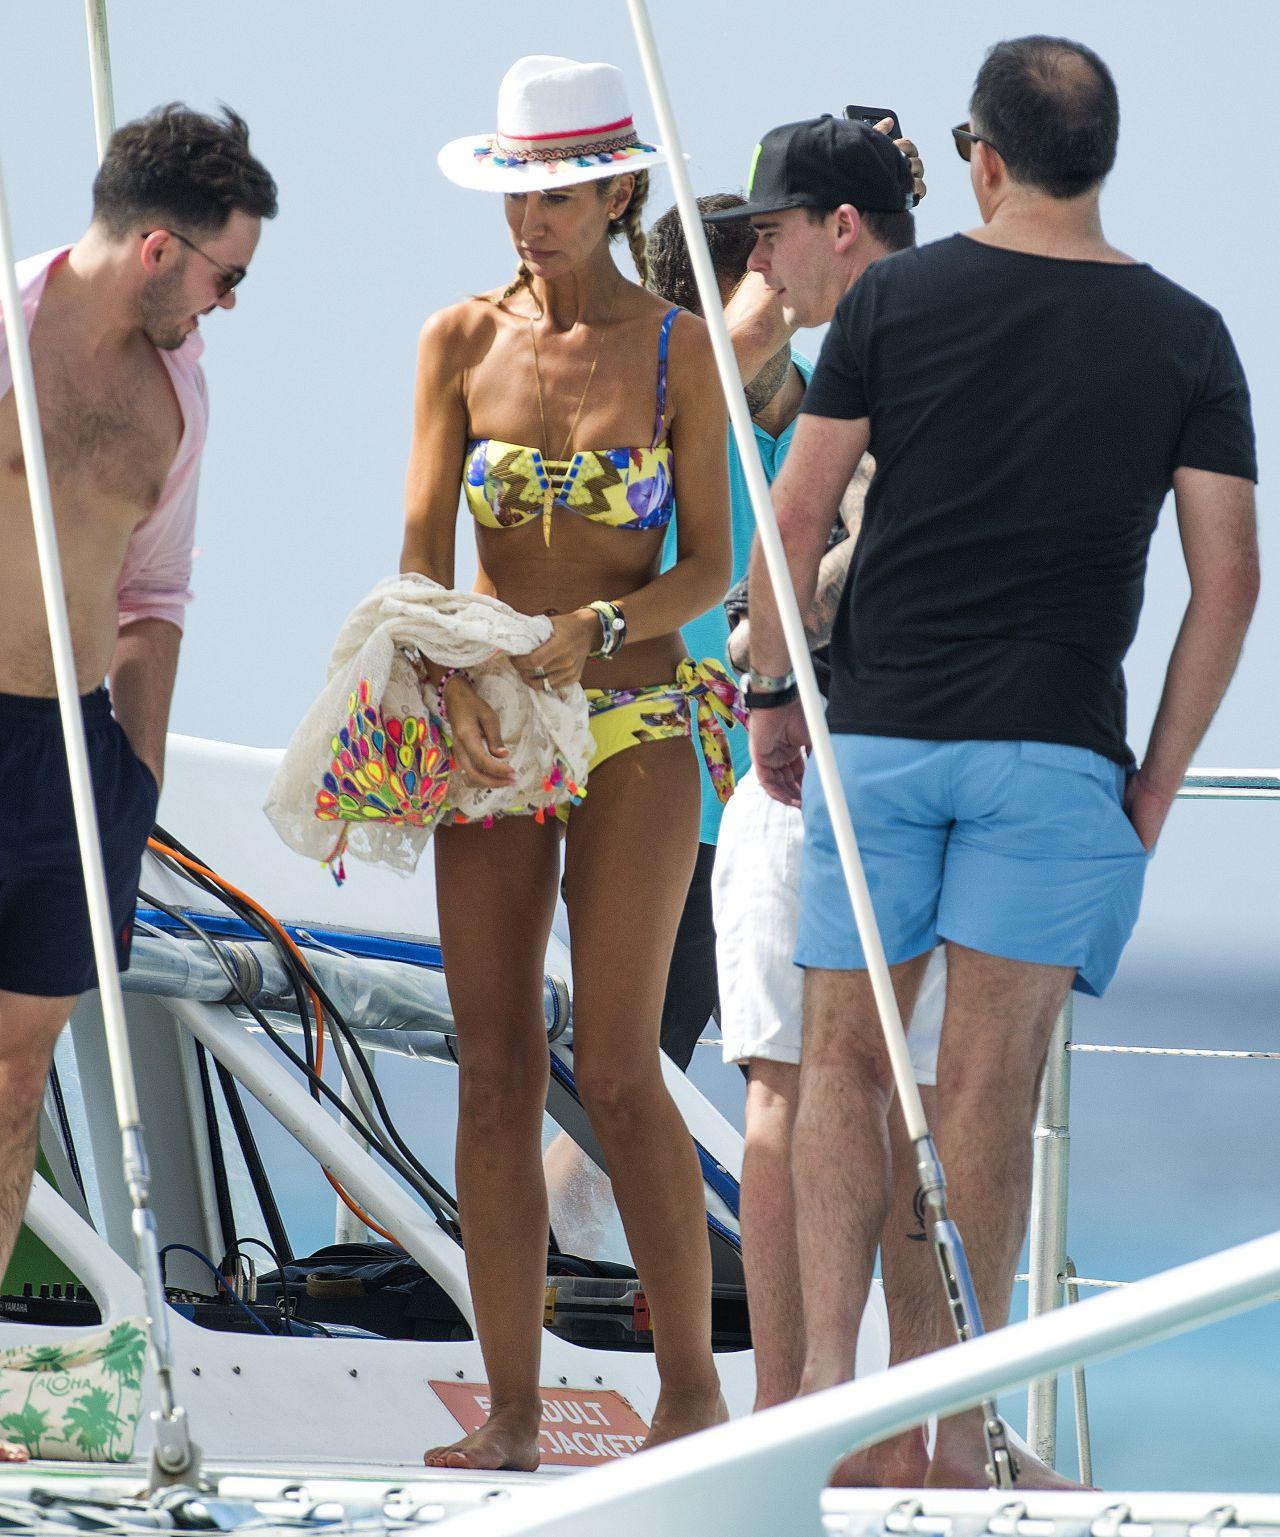 Lady Victoria Hervey in Bikini Boat Party in Barbados Pic 24 of 35